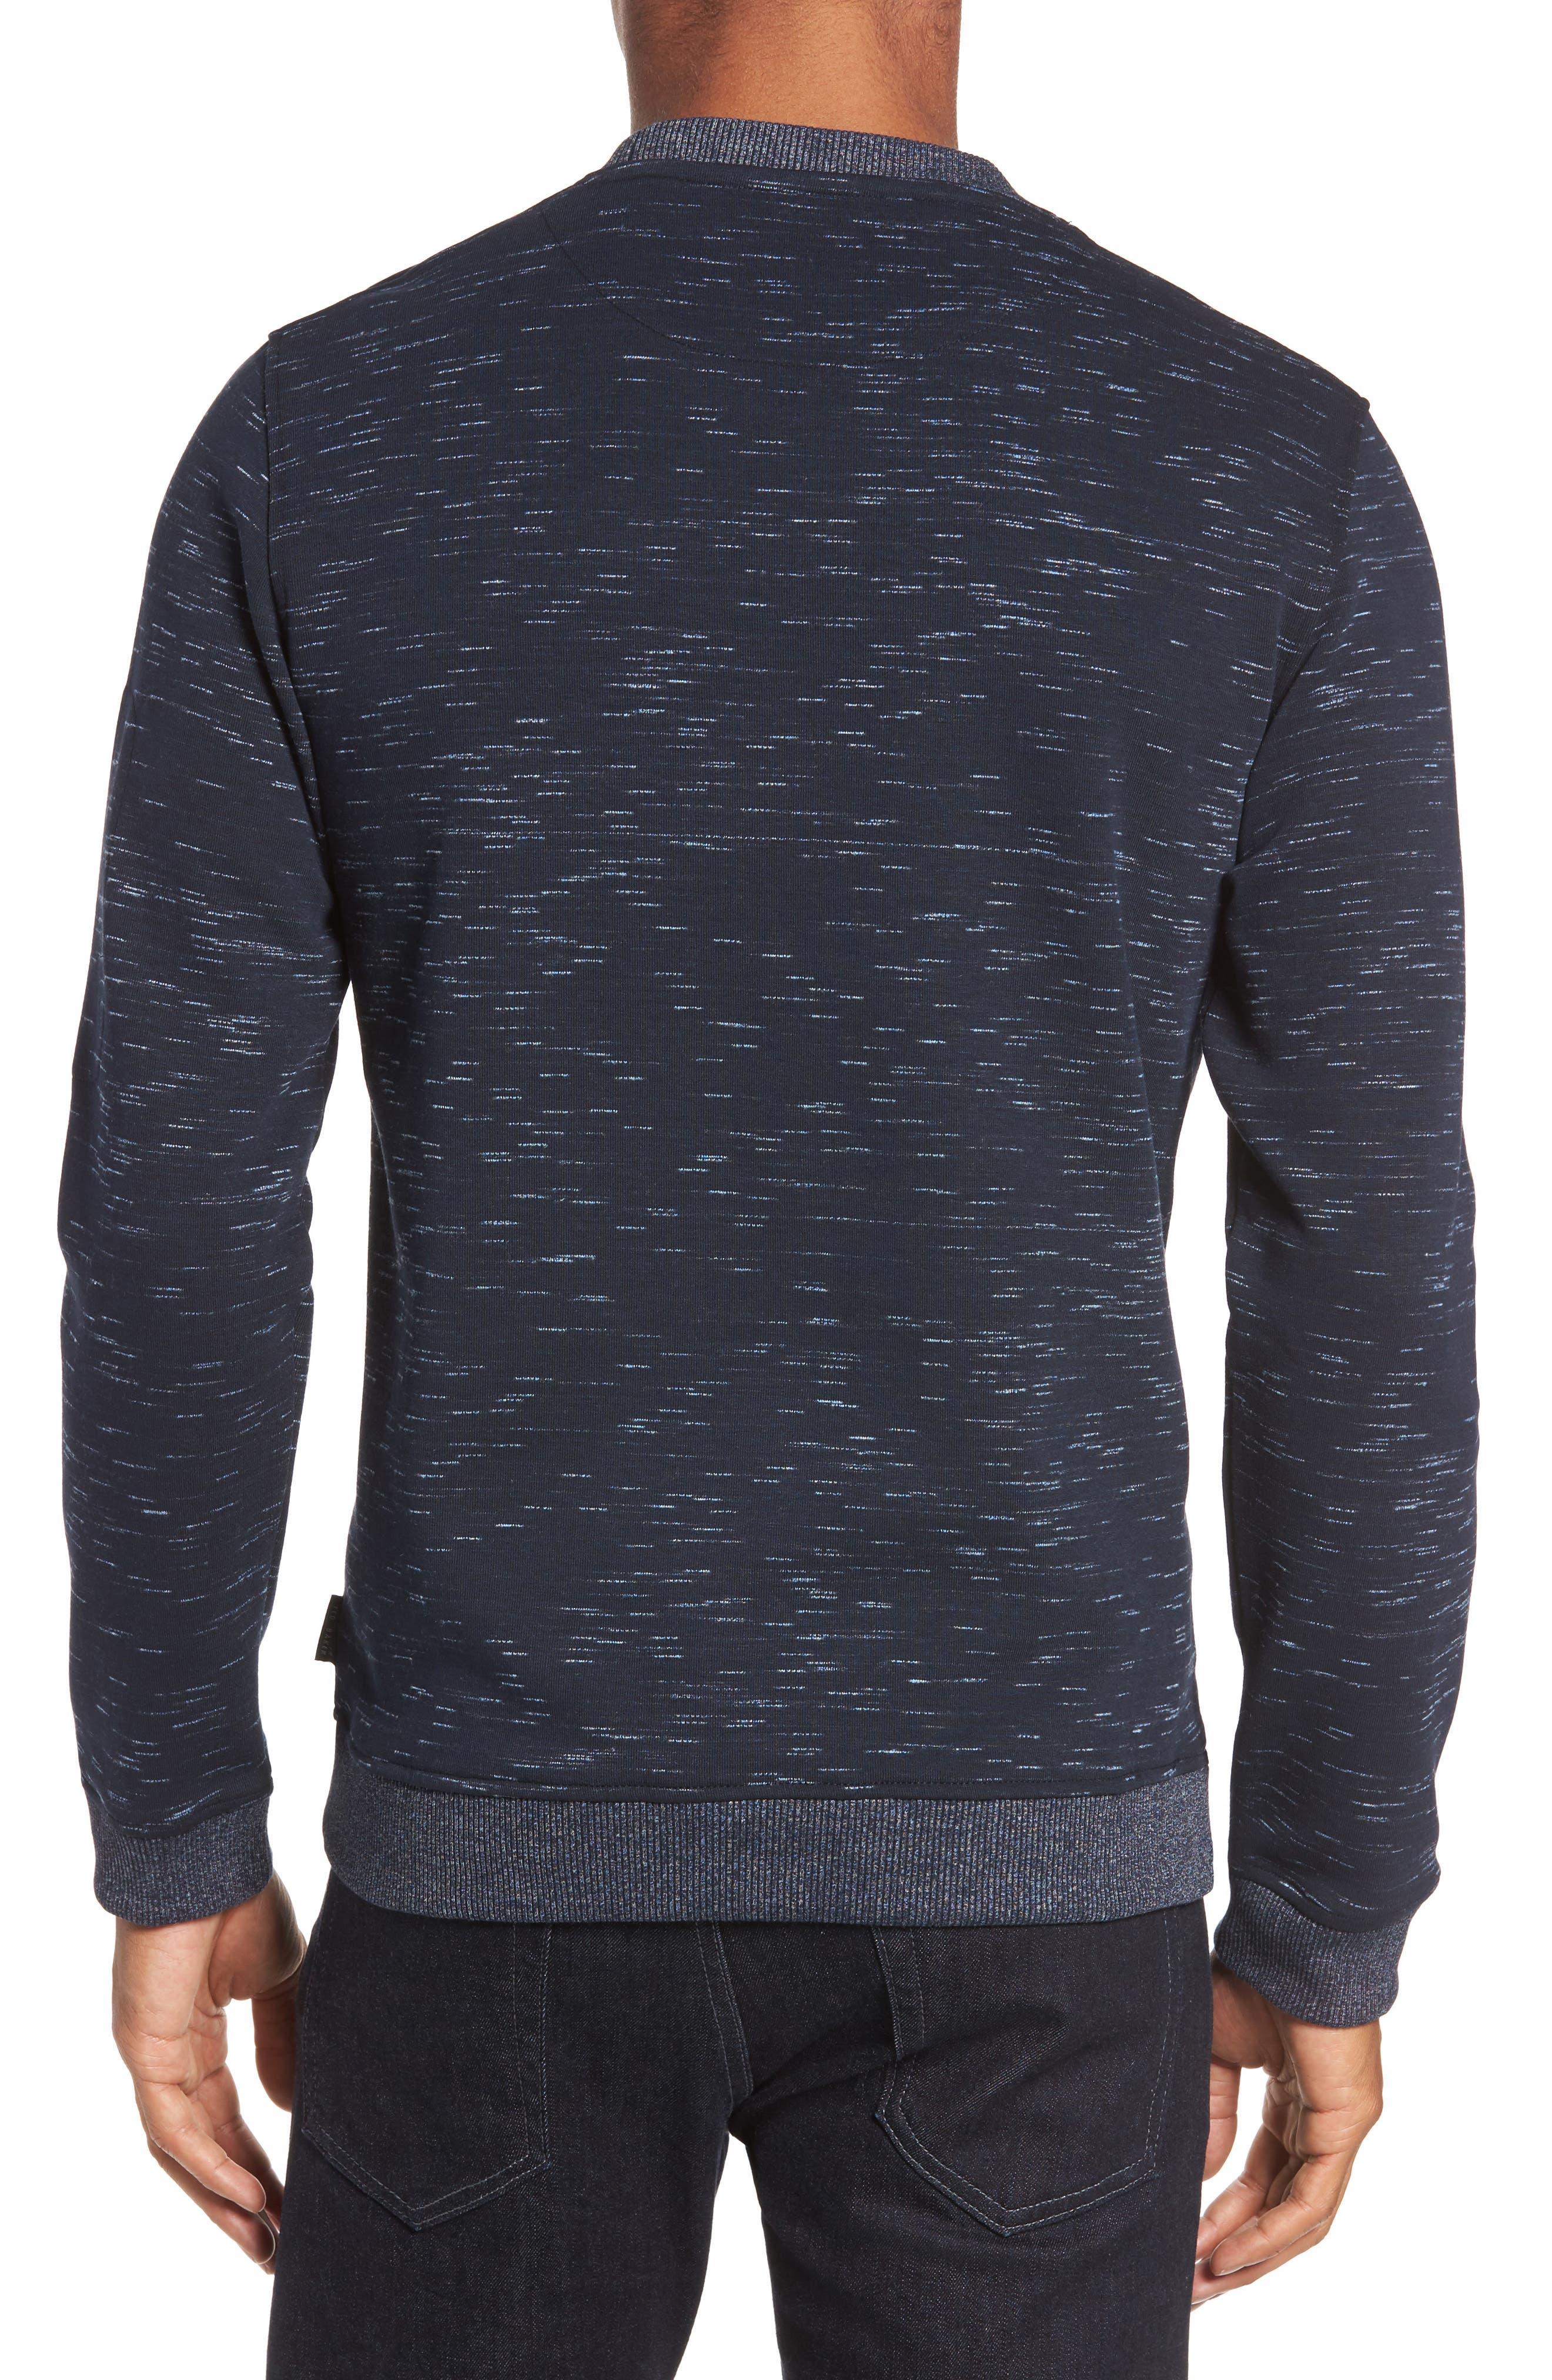 Bepay Jersey Sweatshirt,                             Alternate thumbnail 2, color,                             410